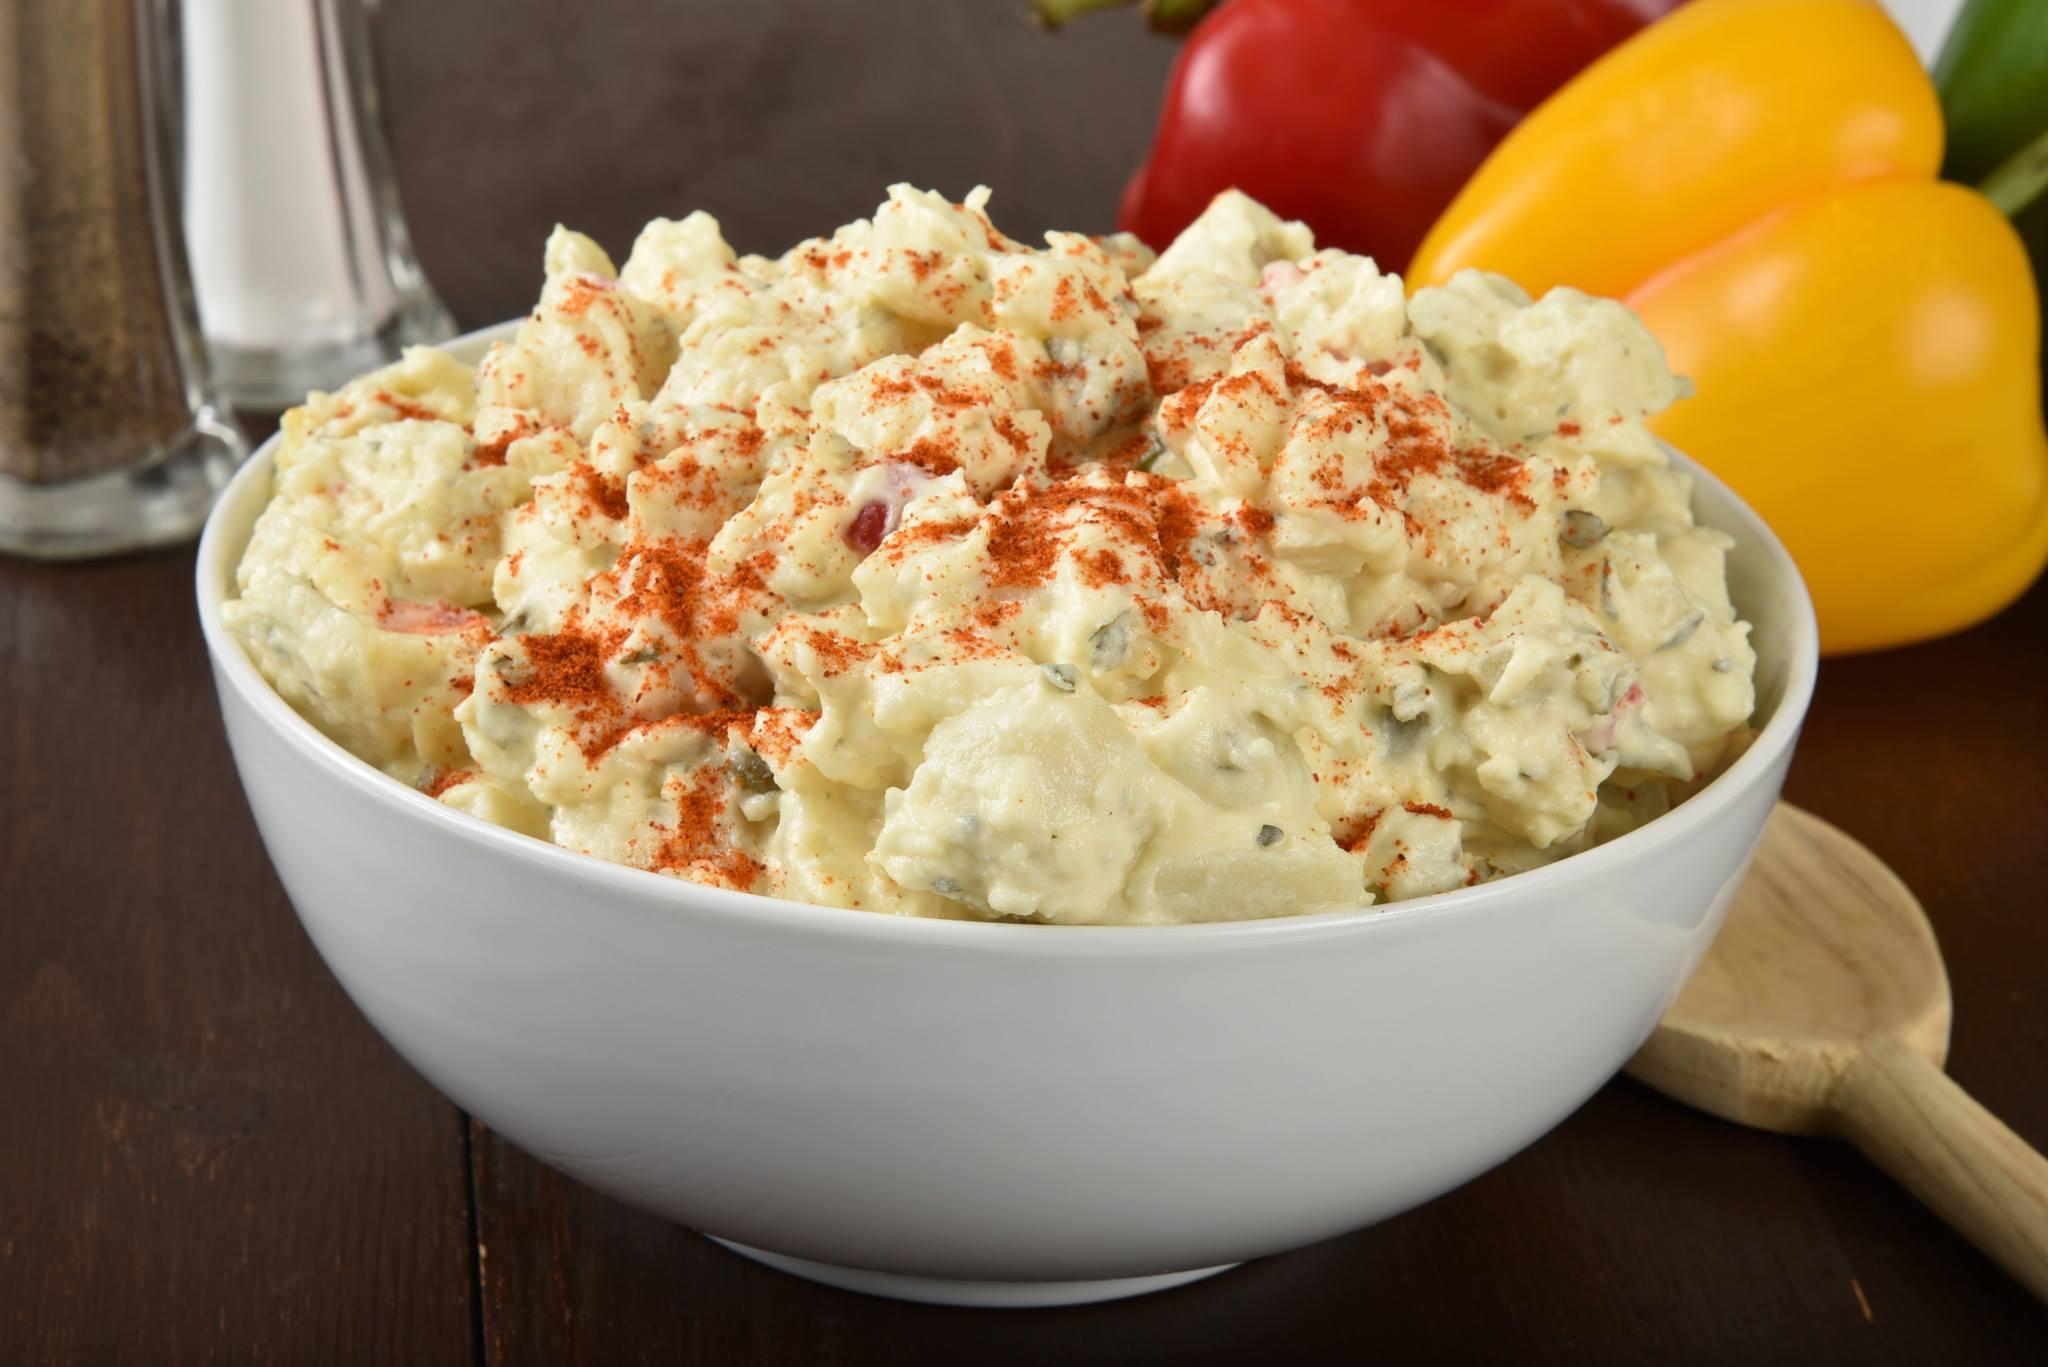 Grandma Brown's Potato Salad